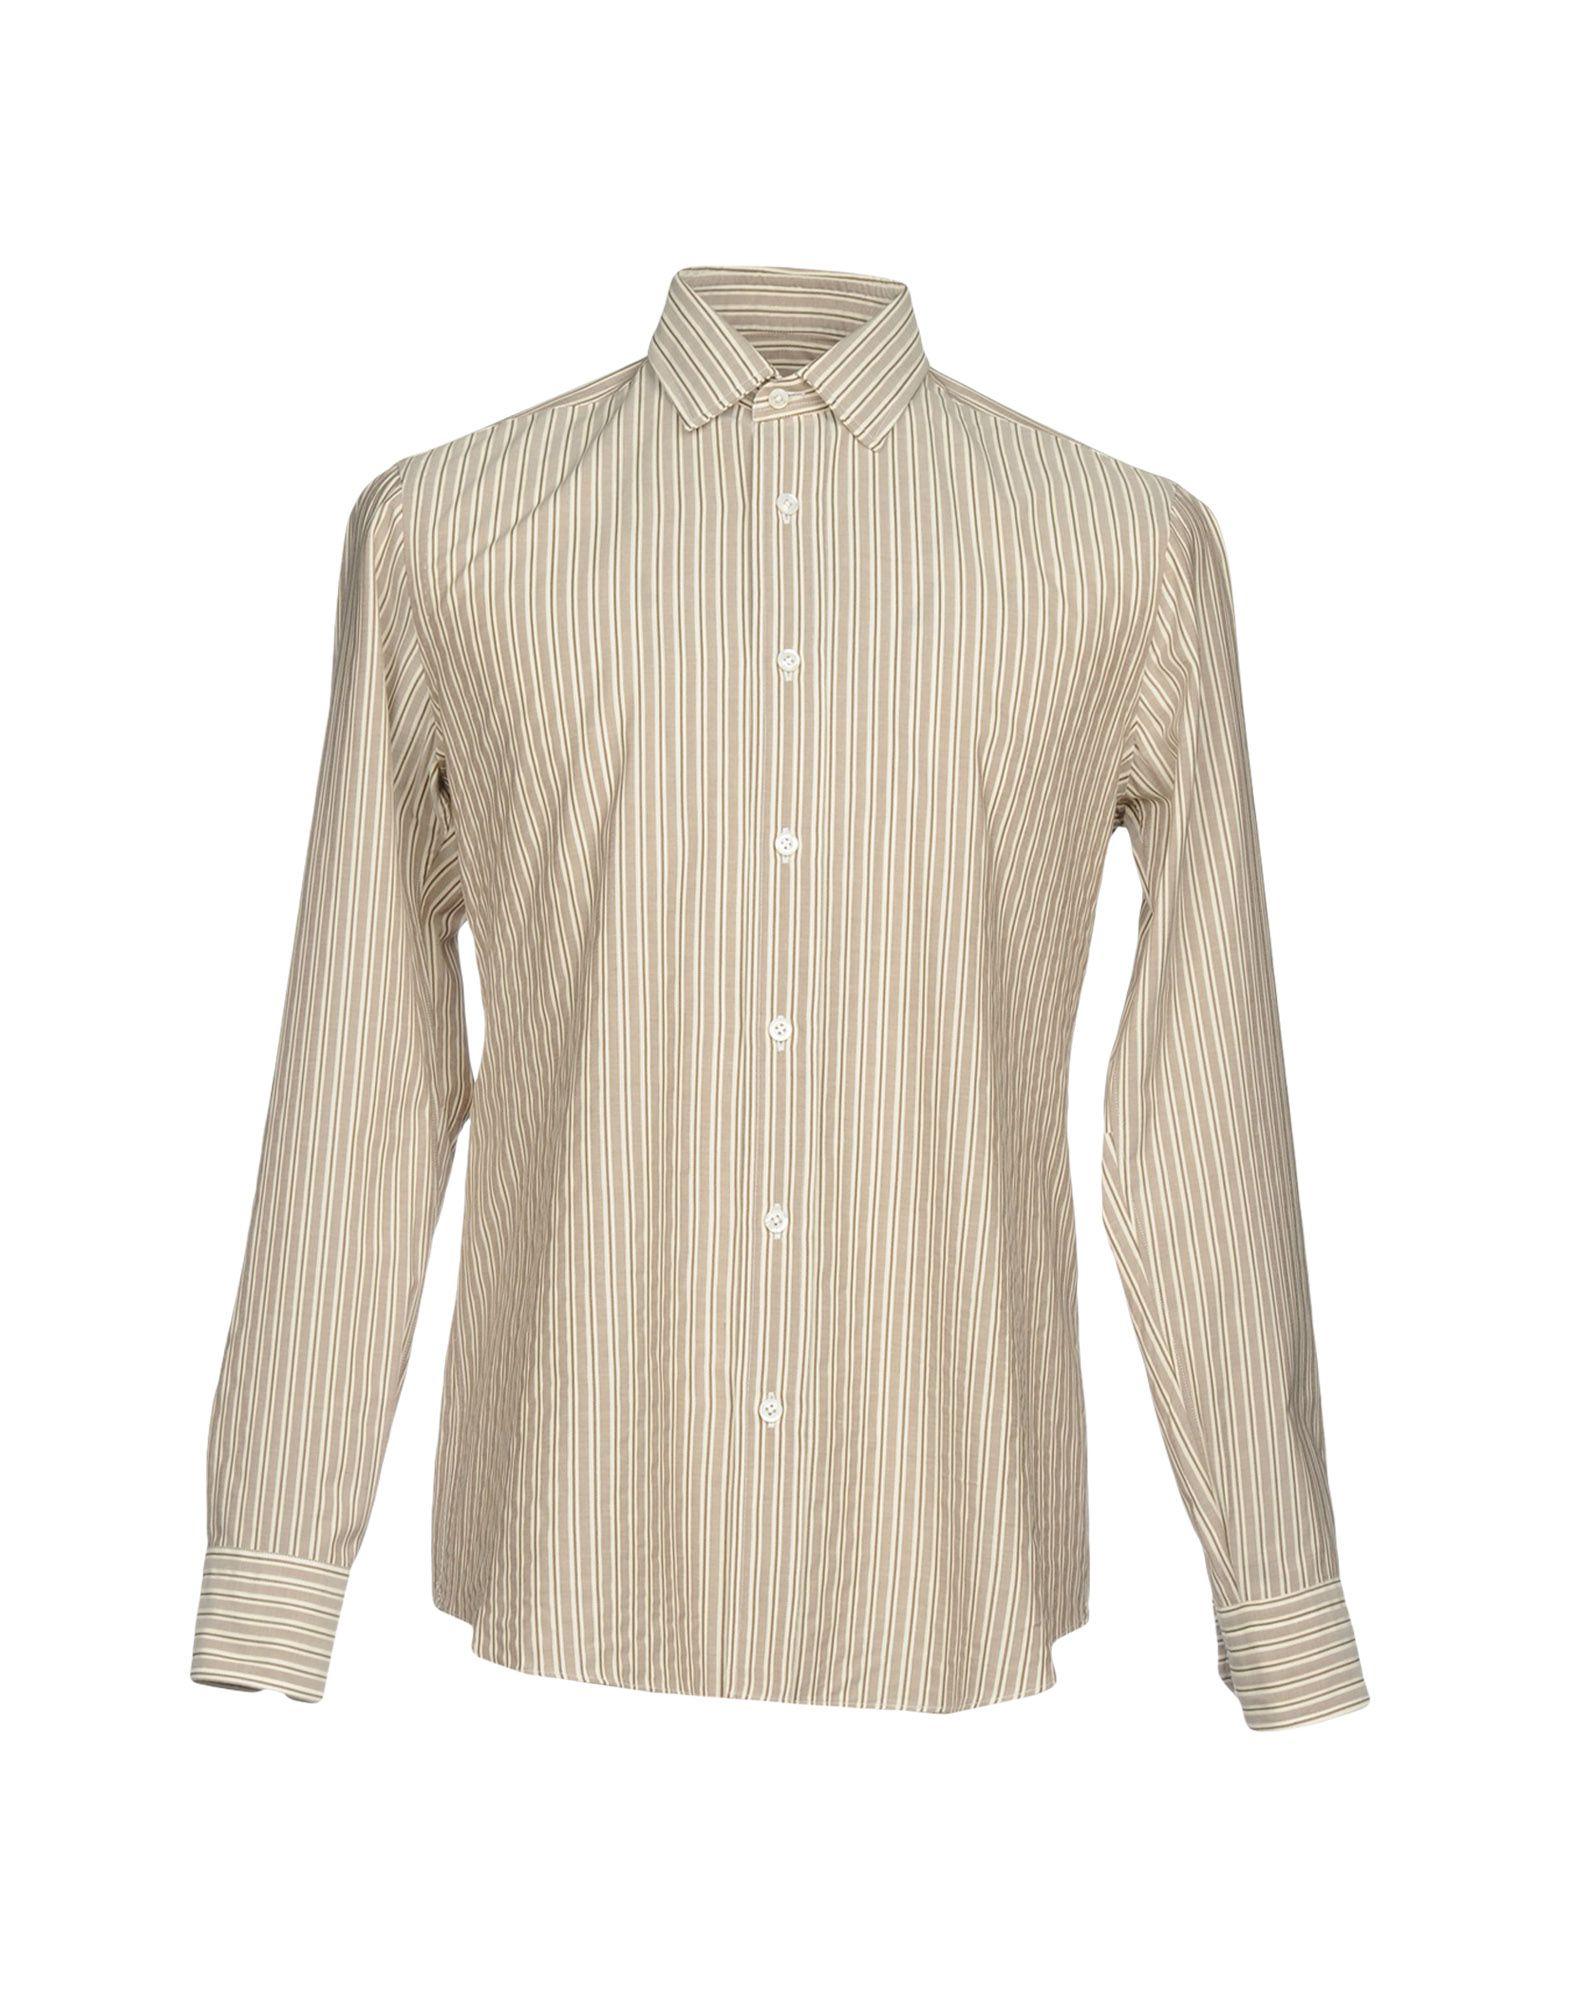 SALVATORE PICCOLO Herren Hemd Farbe Khaki Größe 9